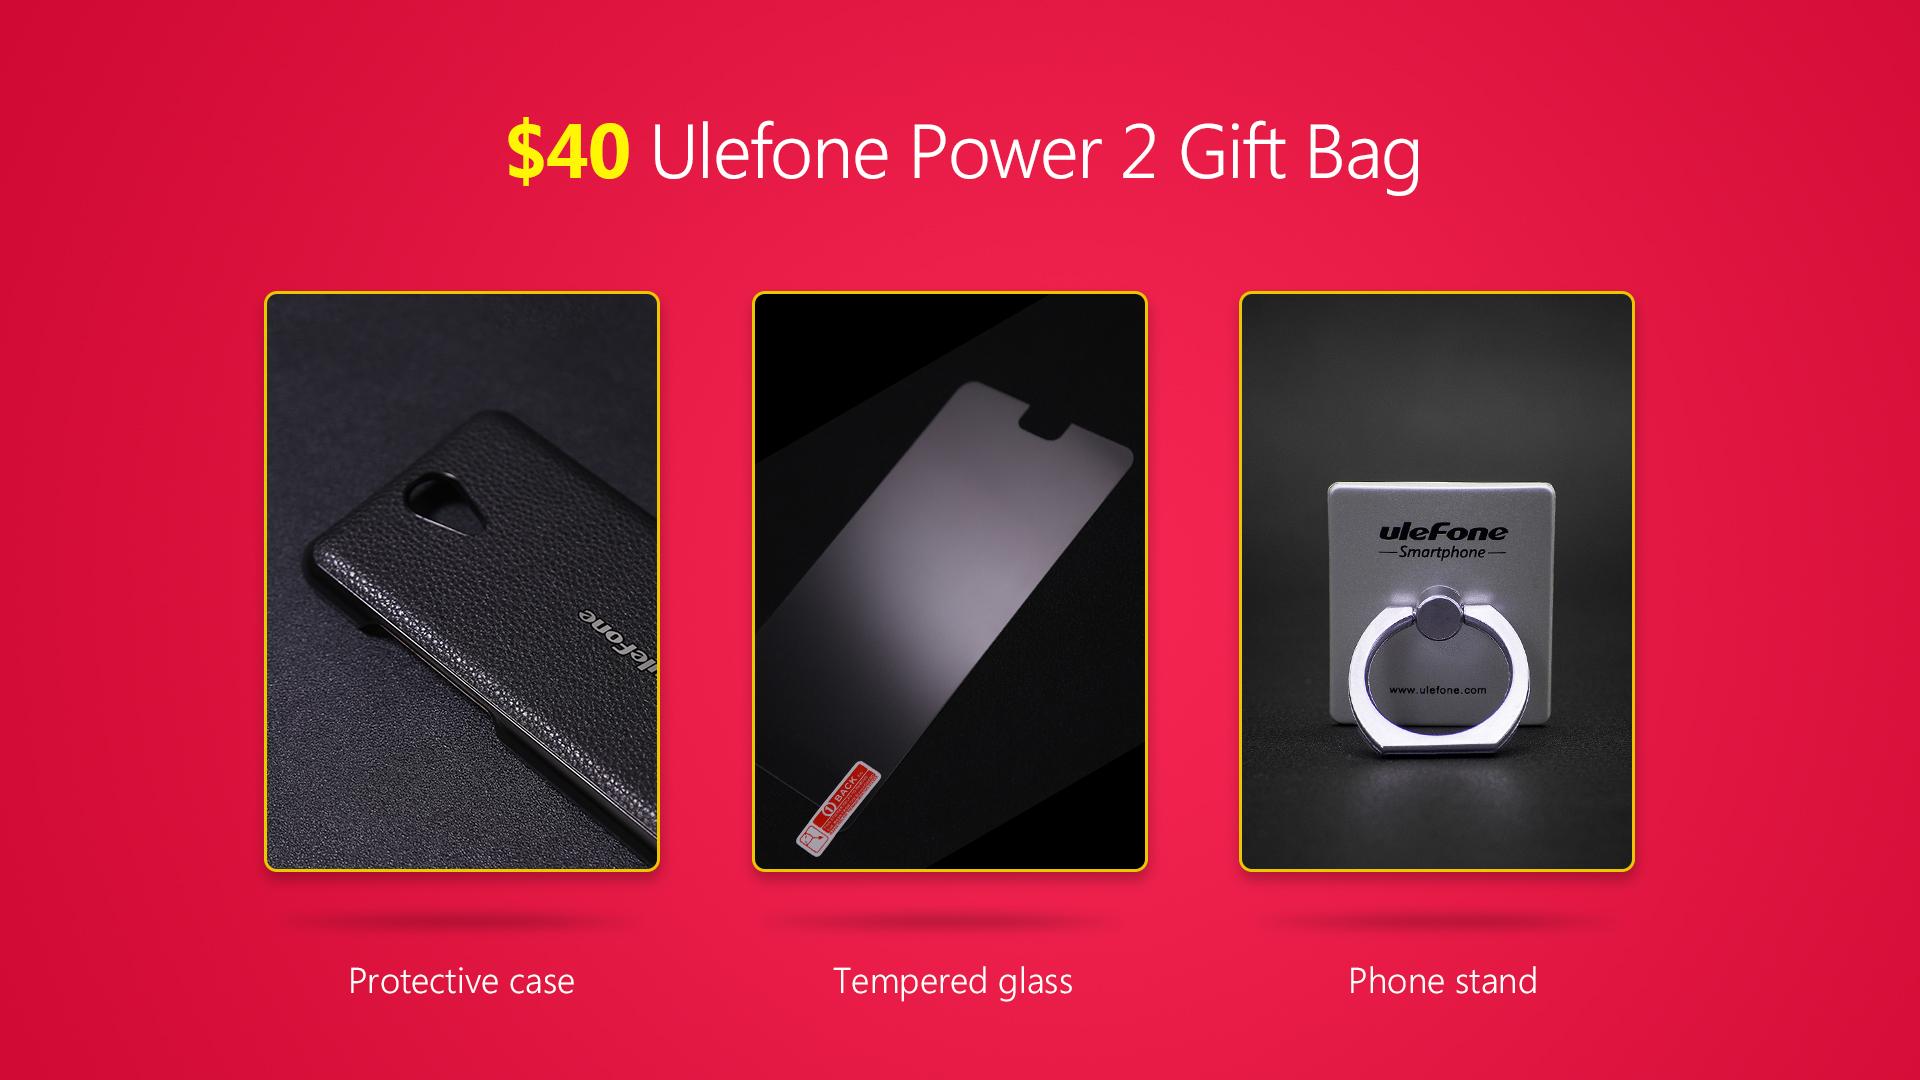 Ulefone Power 2 regali